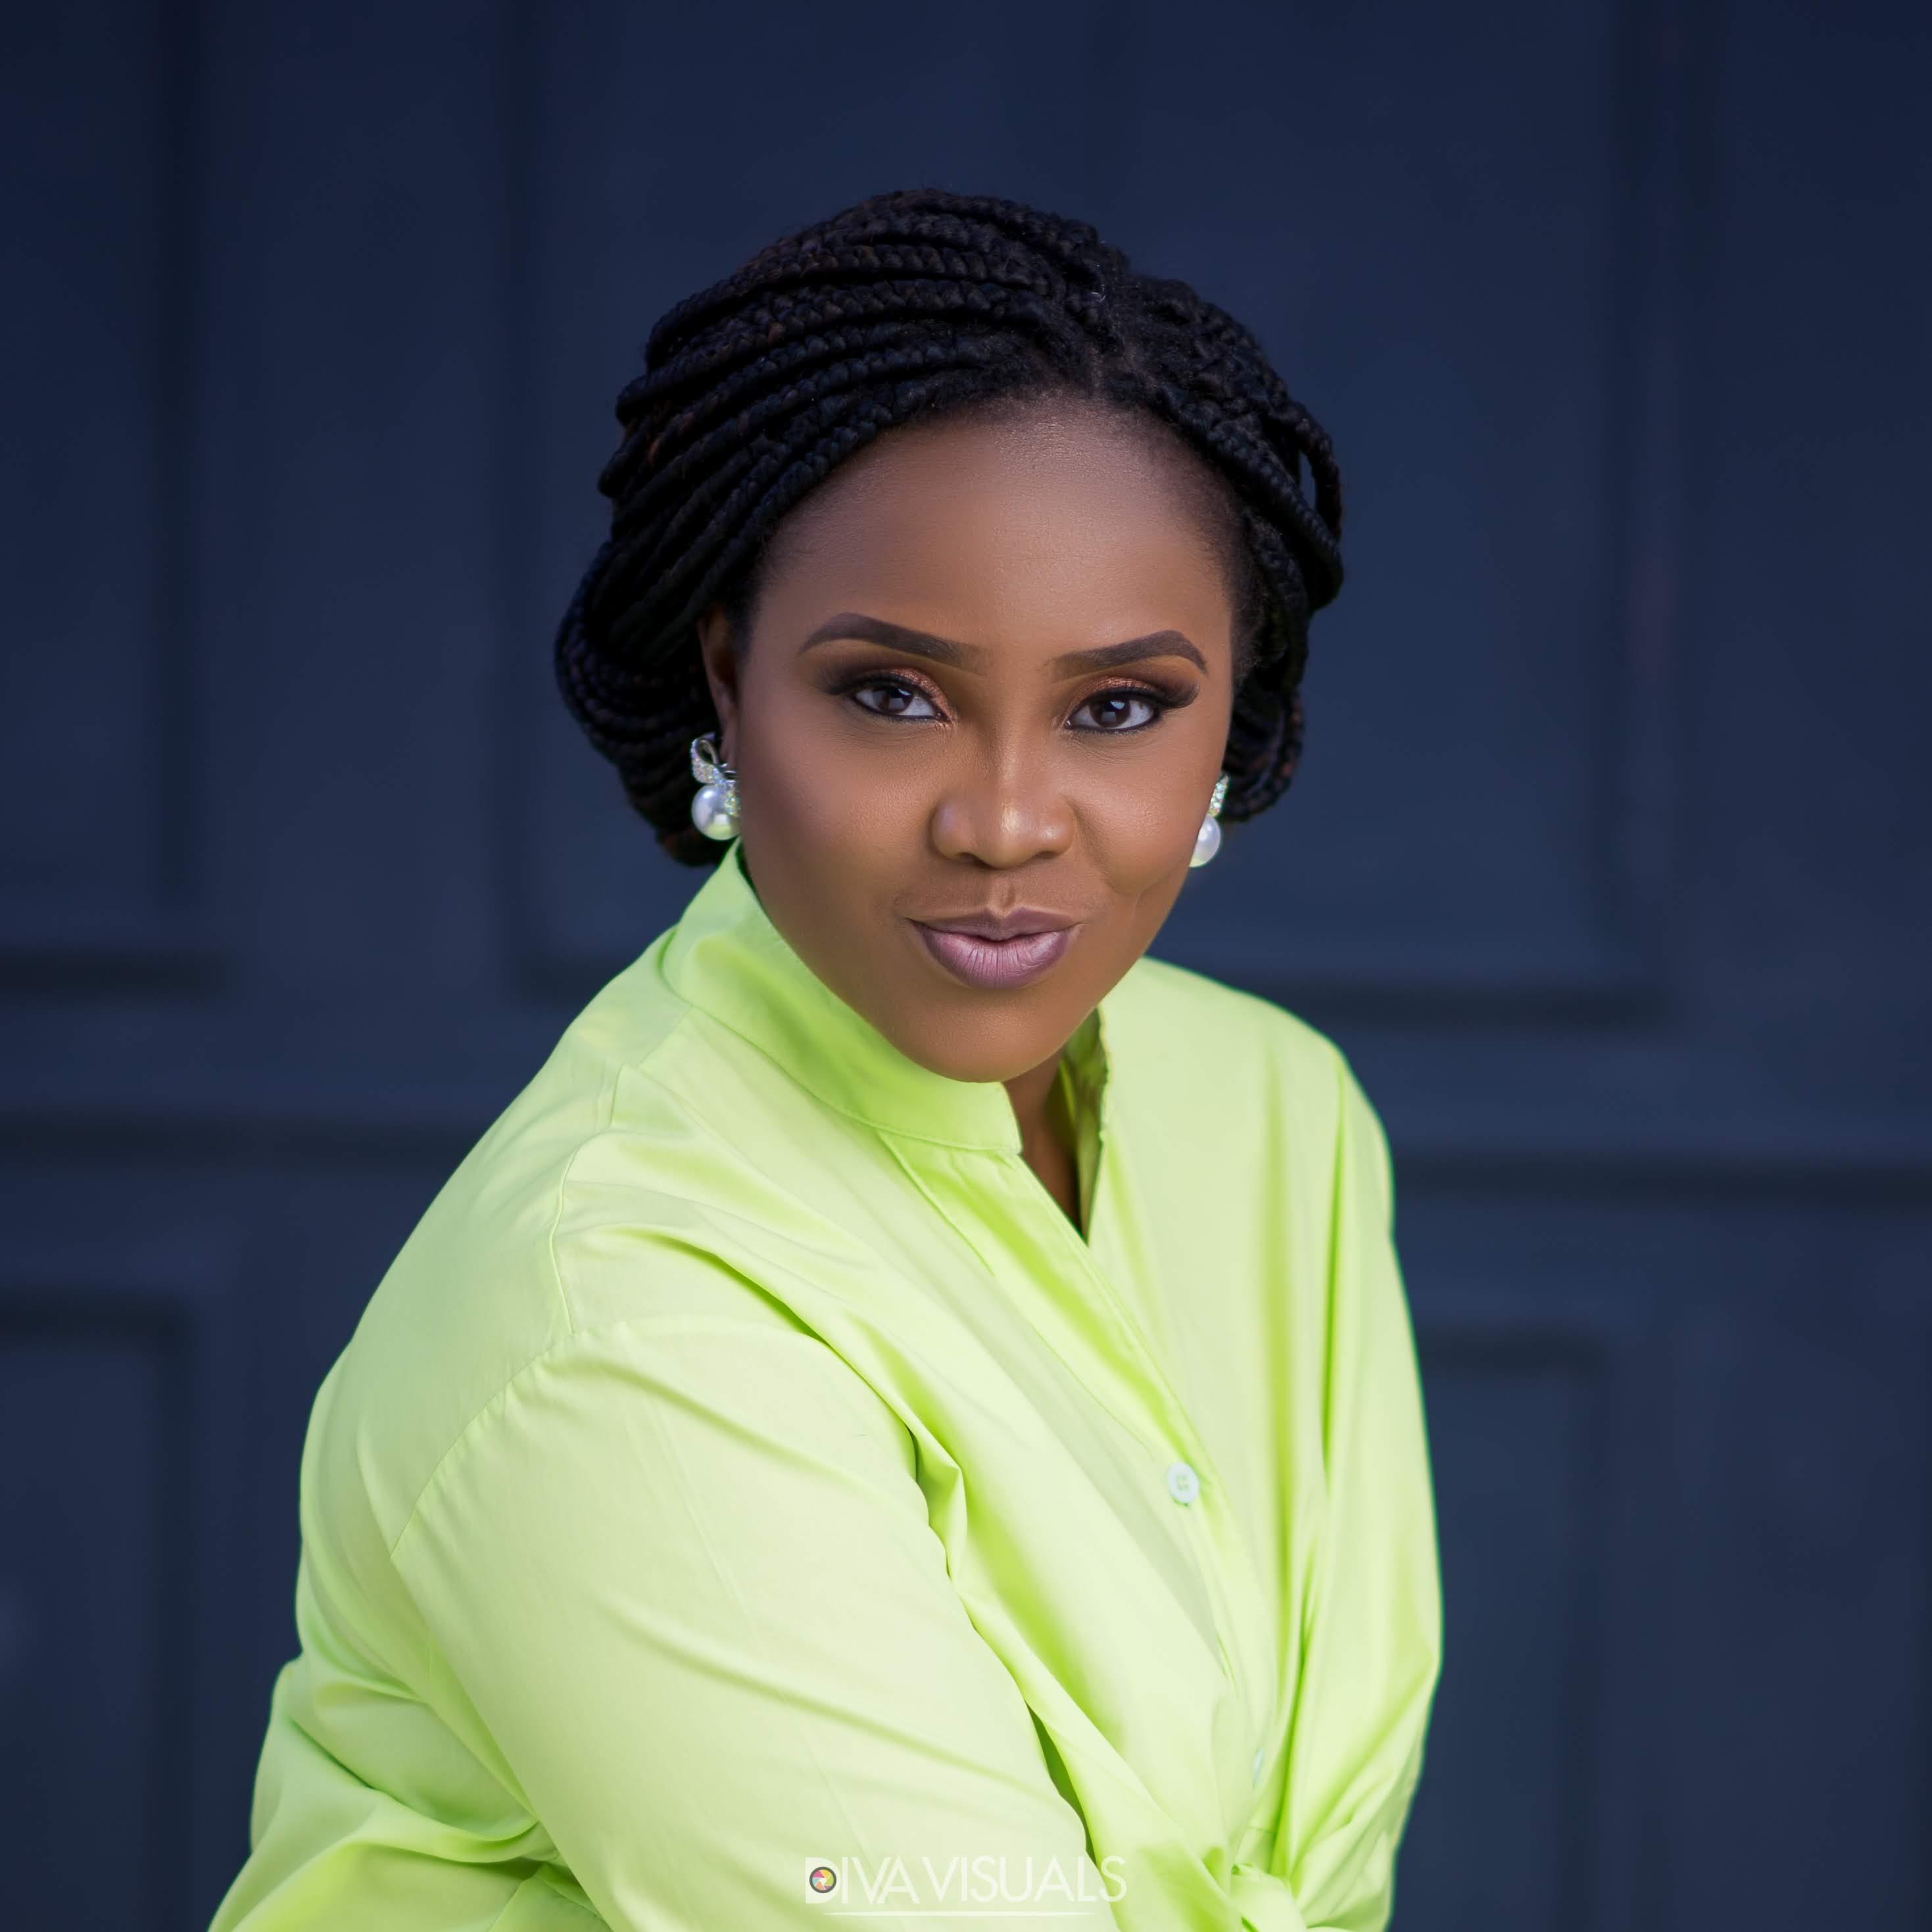 Queenette Elinama, a Child-Hygiene expert